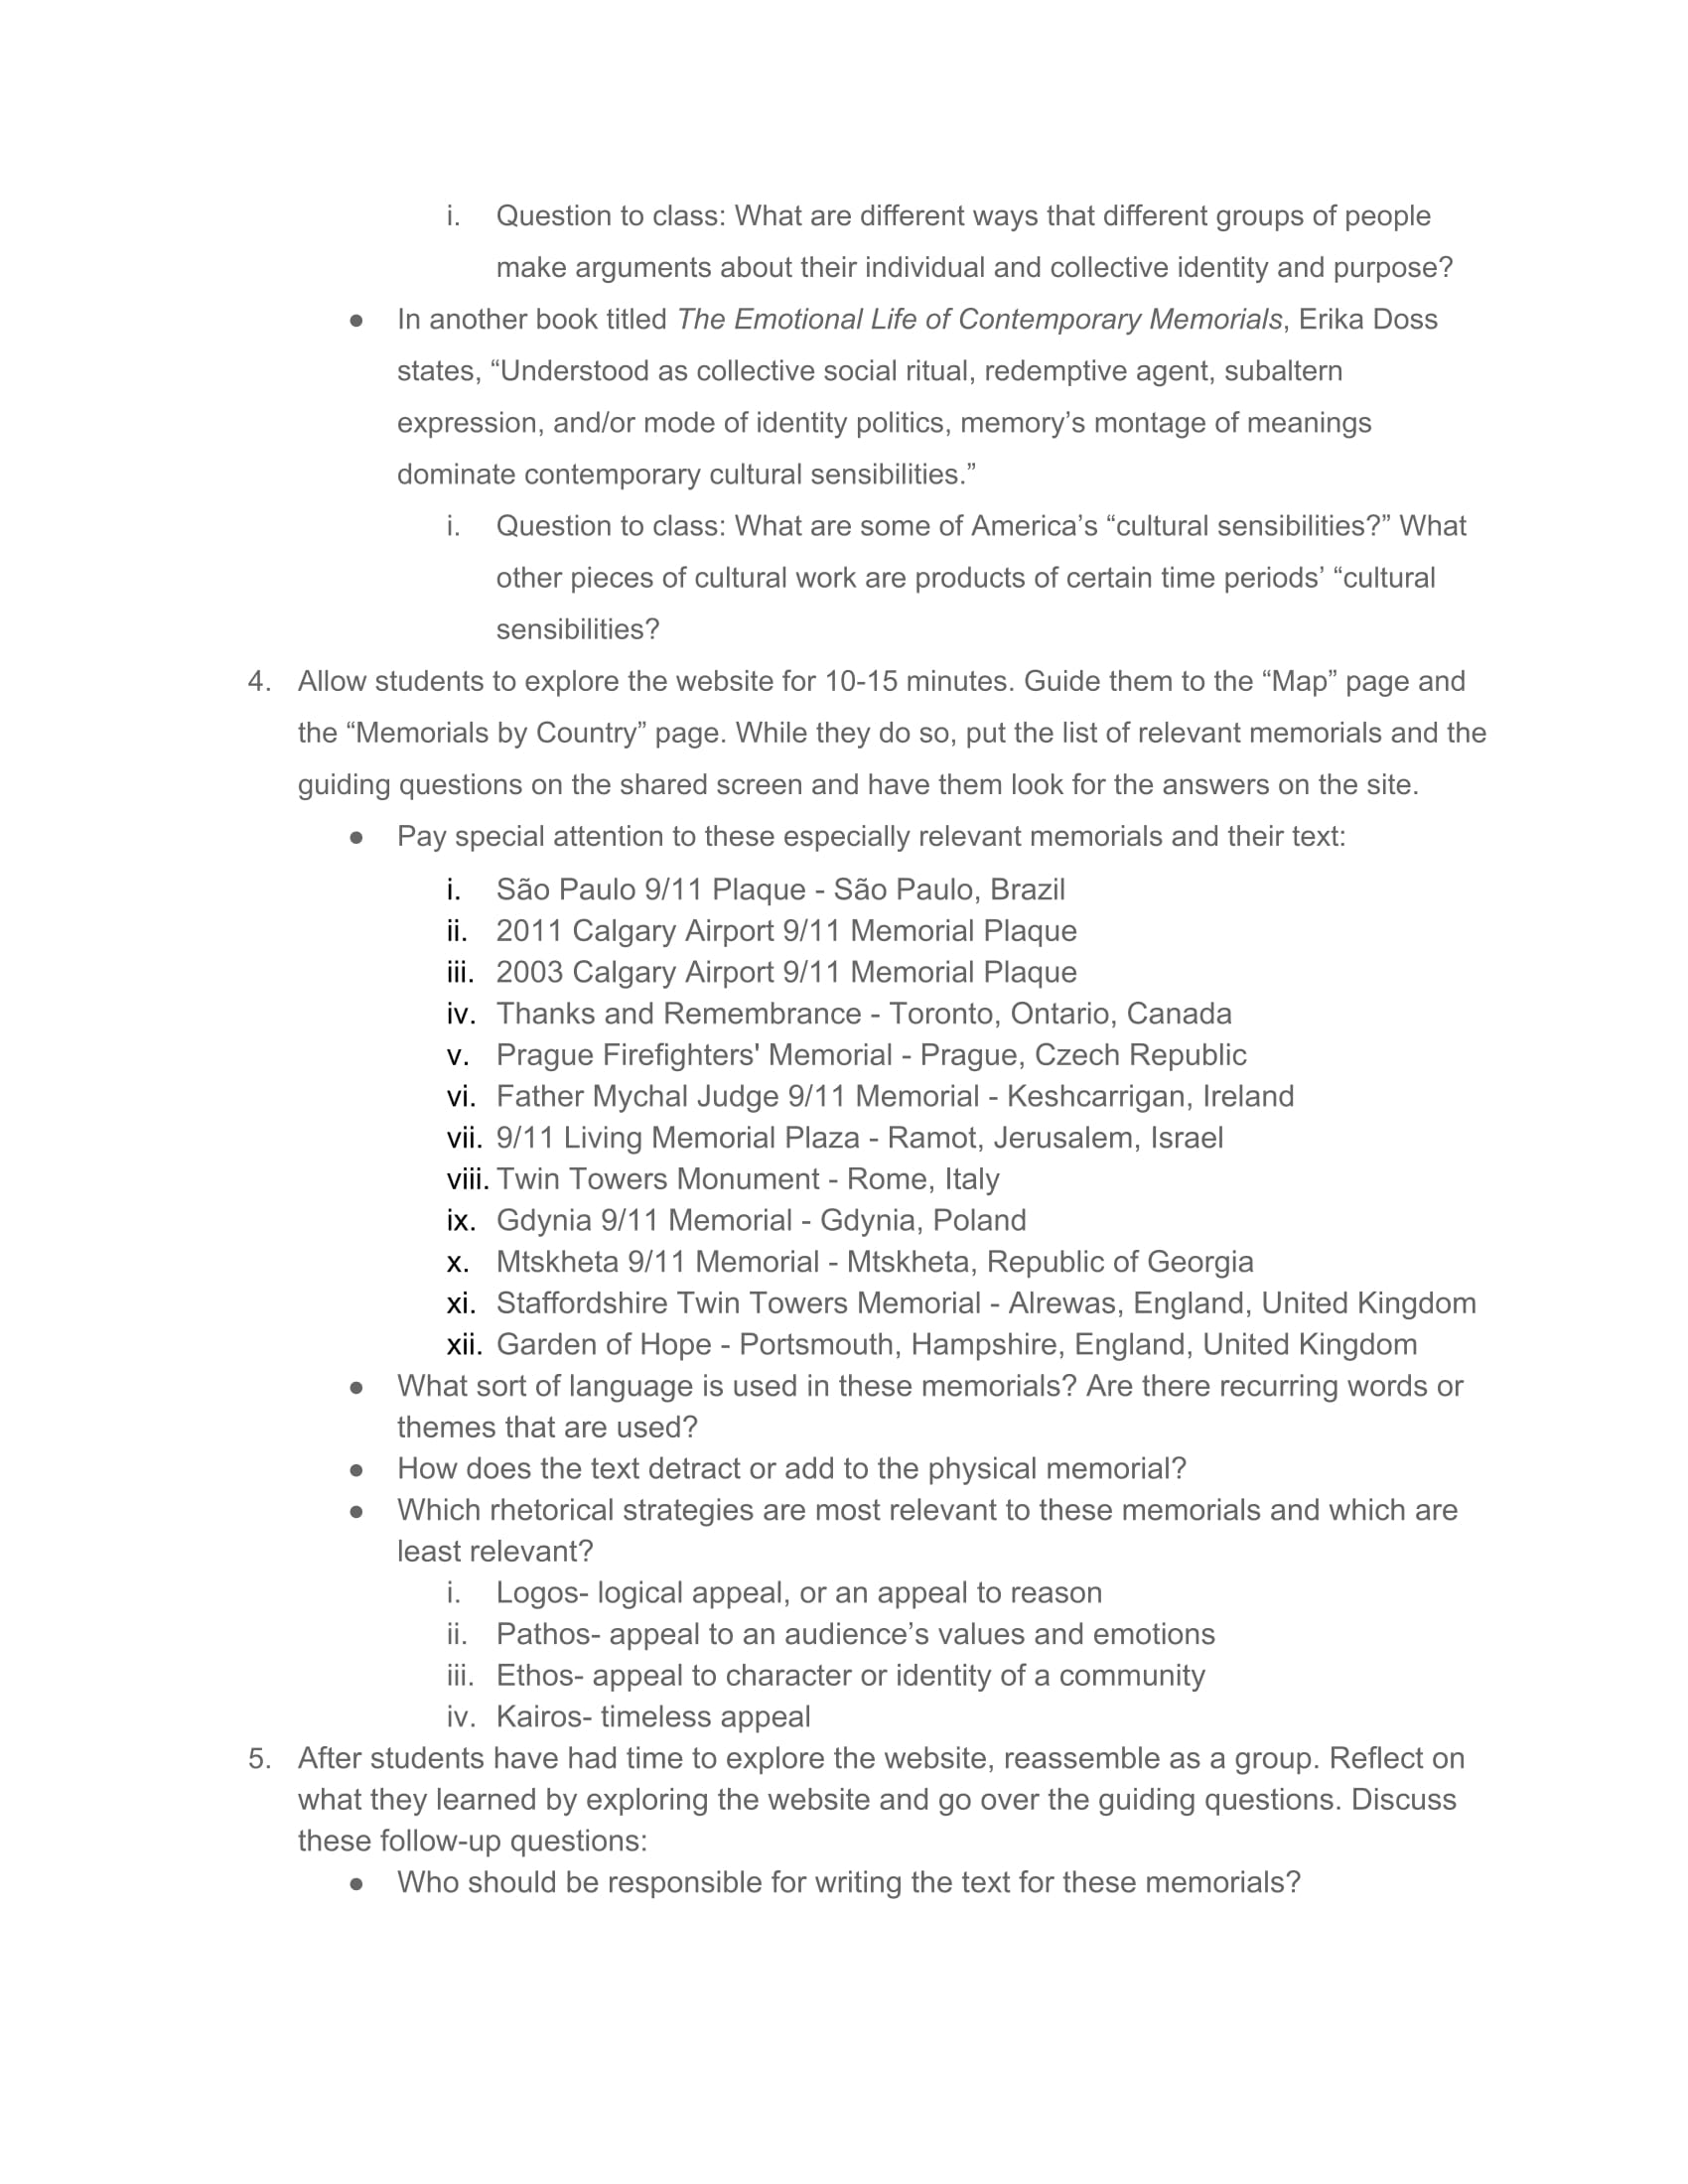 English Lesson Plan Final-5.jpg